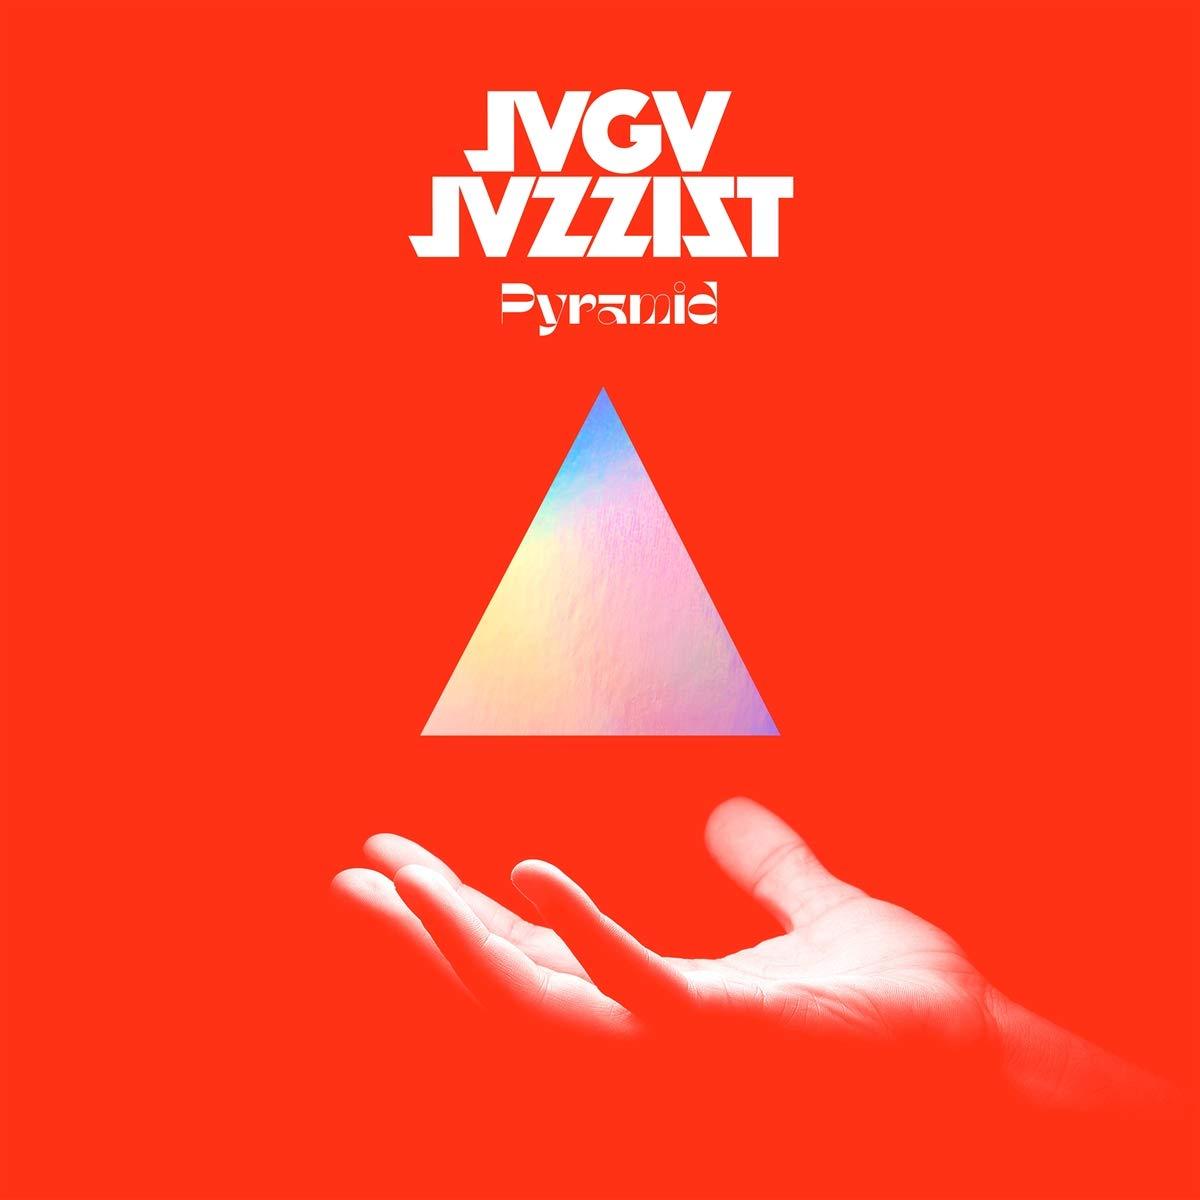 Jaga Jazzist - Pyramid (2020) [FLAC] Download